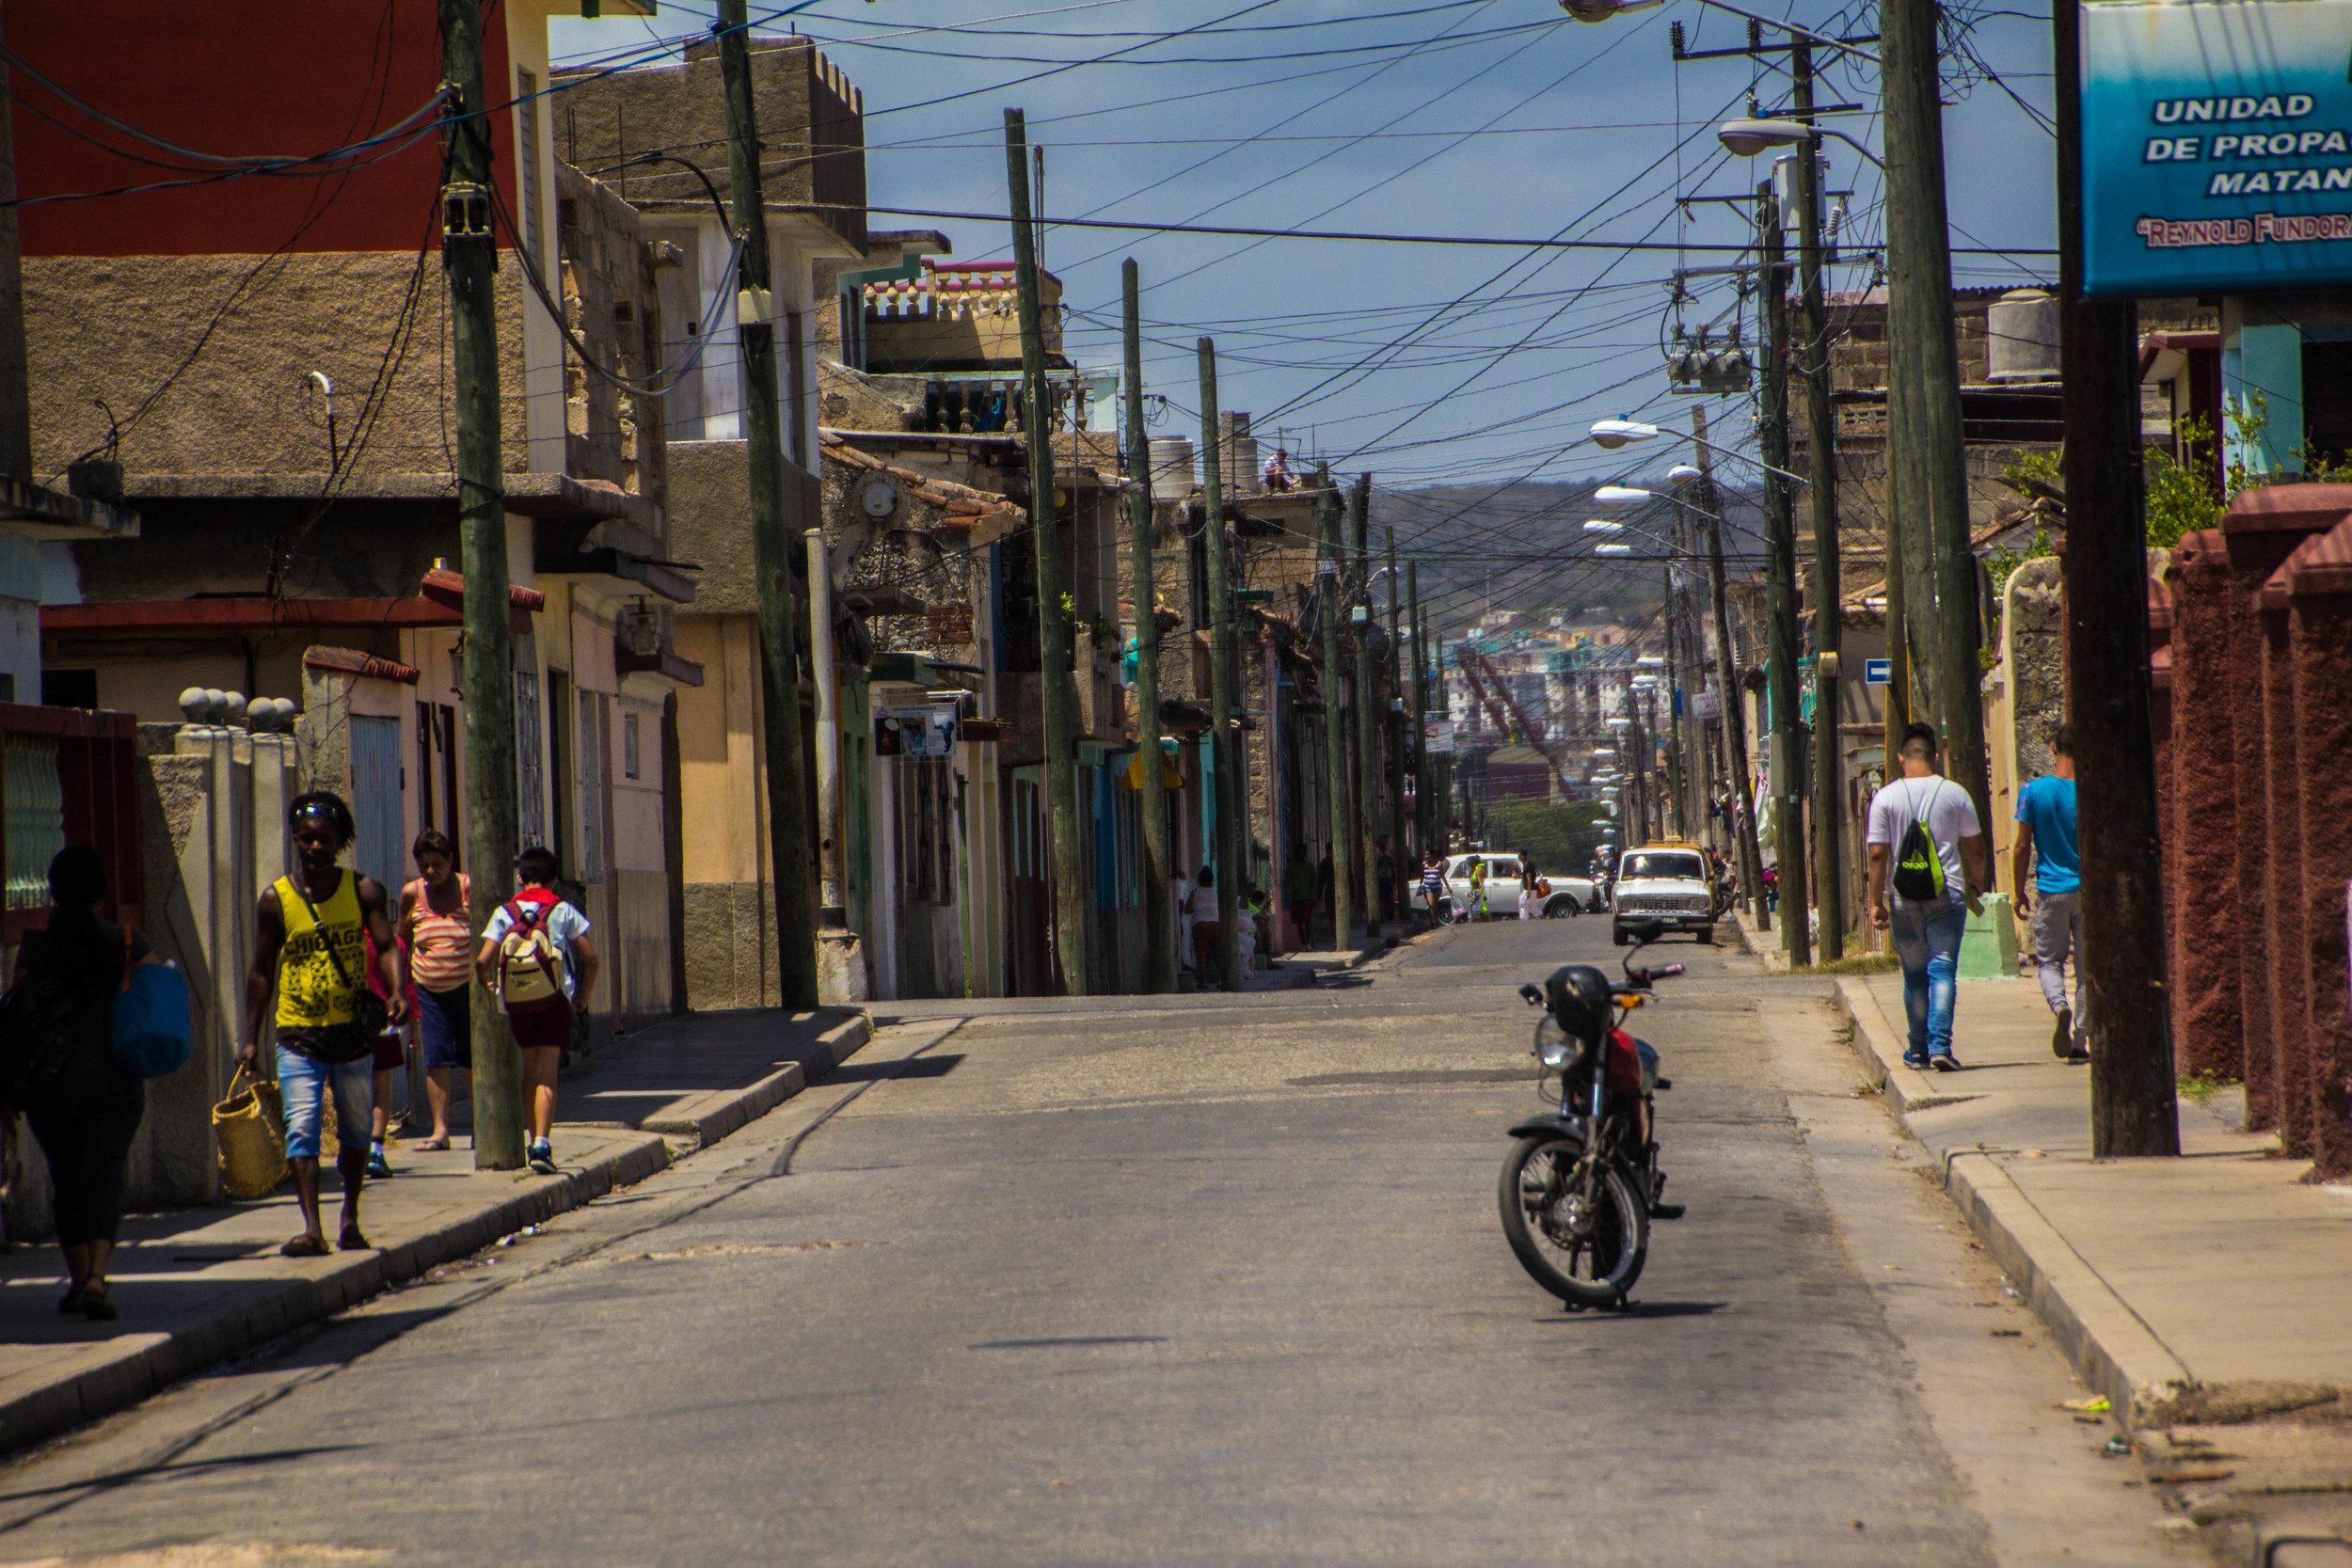 streets motorcycle matanzas cuba-1-2.jpg